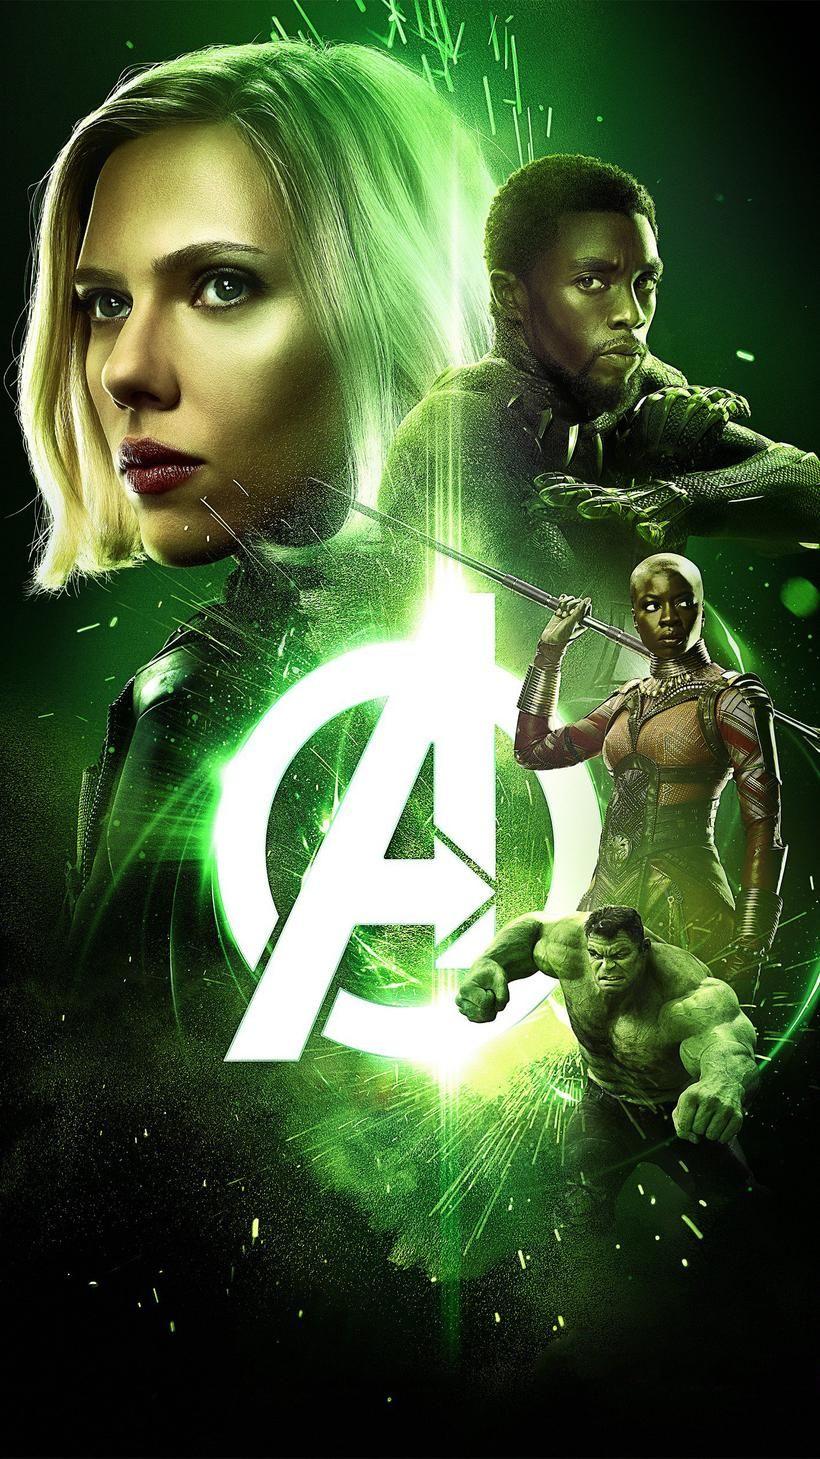 Avengers Infinity War 2018 Phone Wallpaper Avengers Pinterest